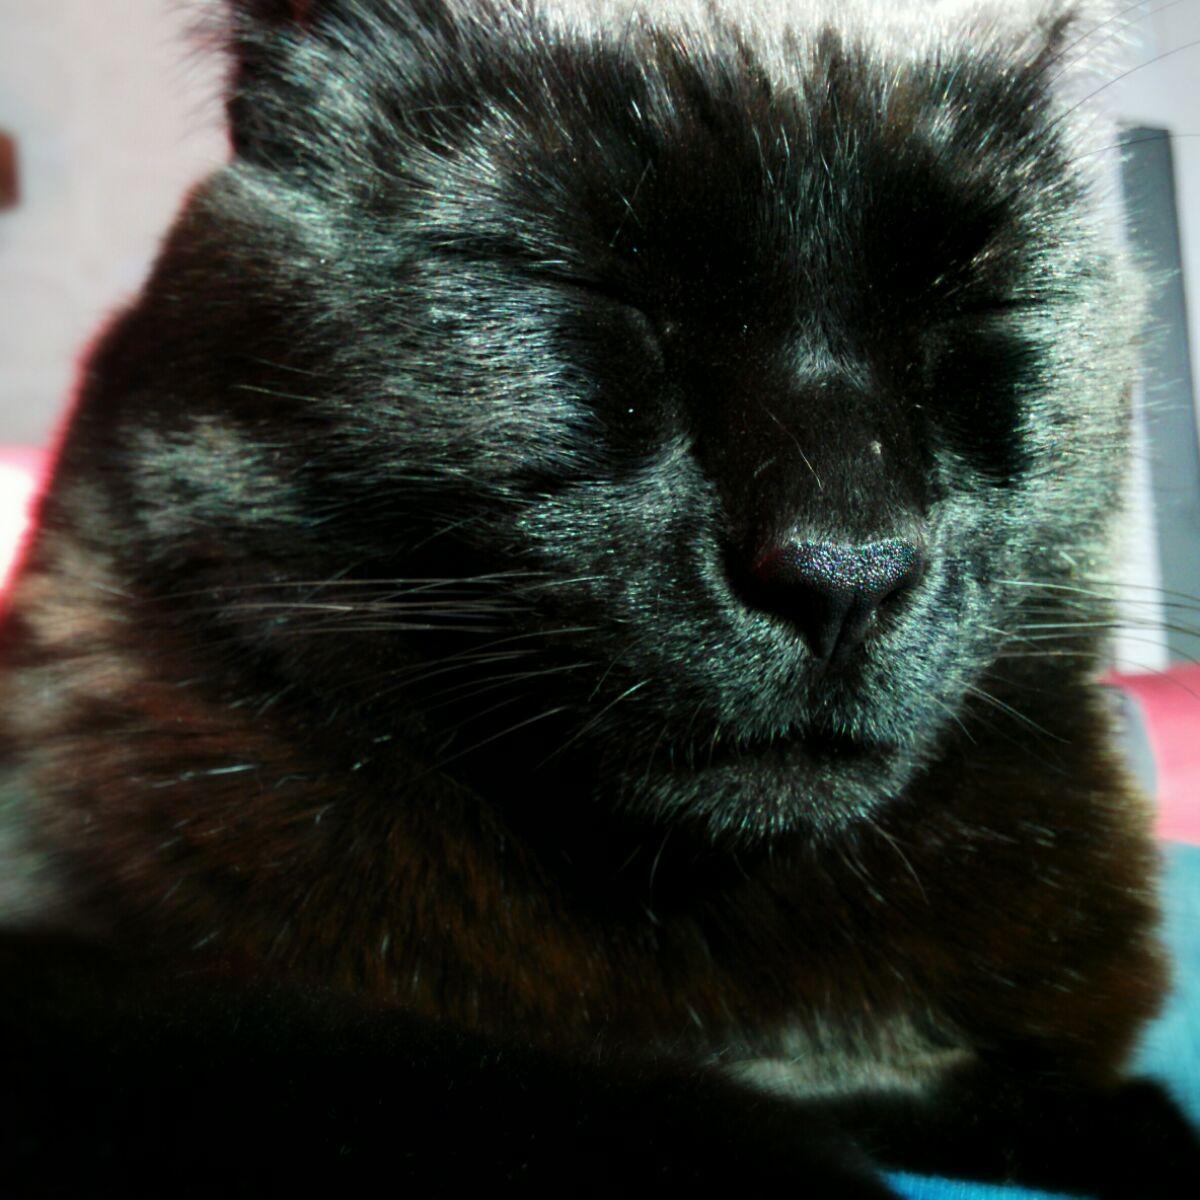 black cat takes a cat nap